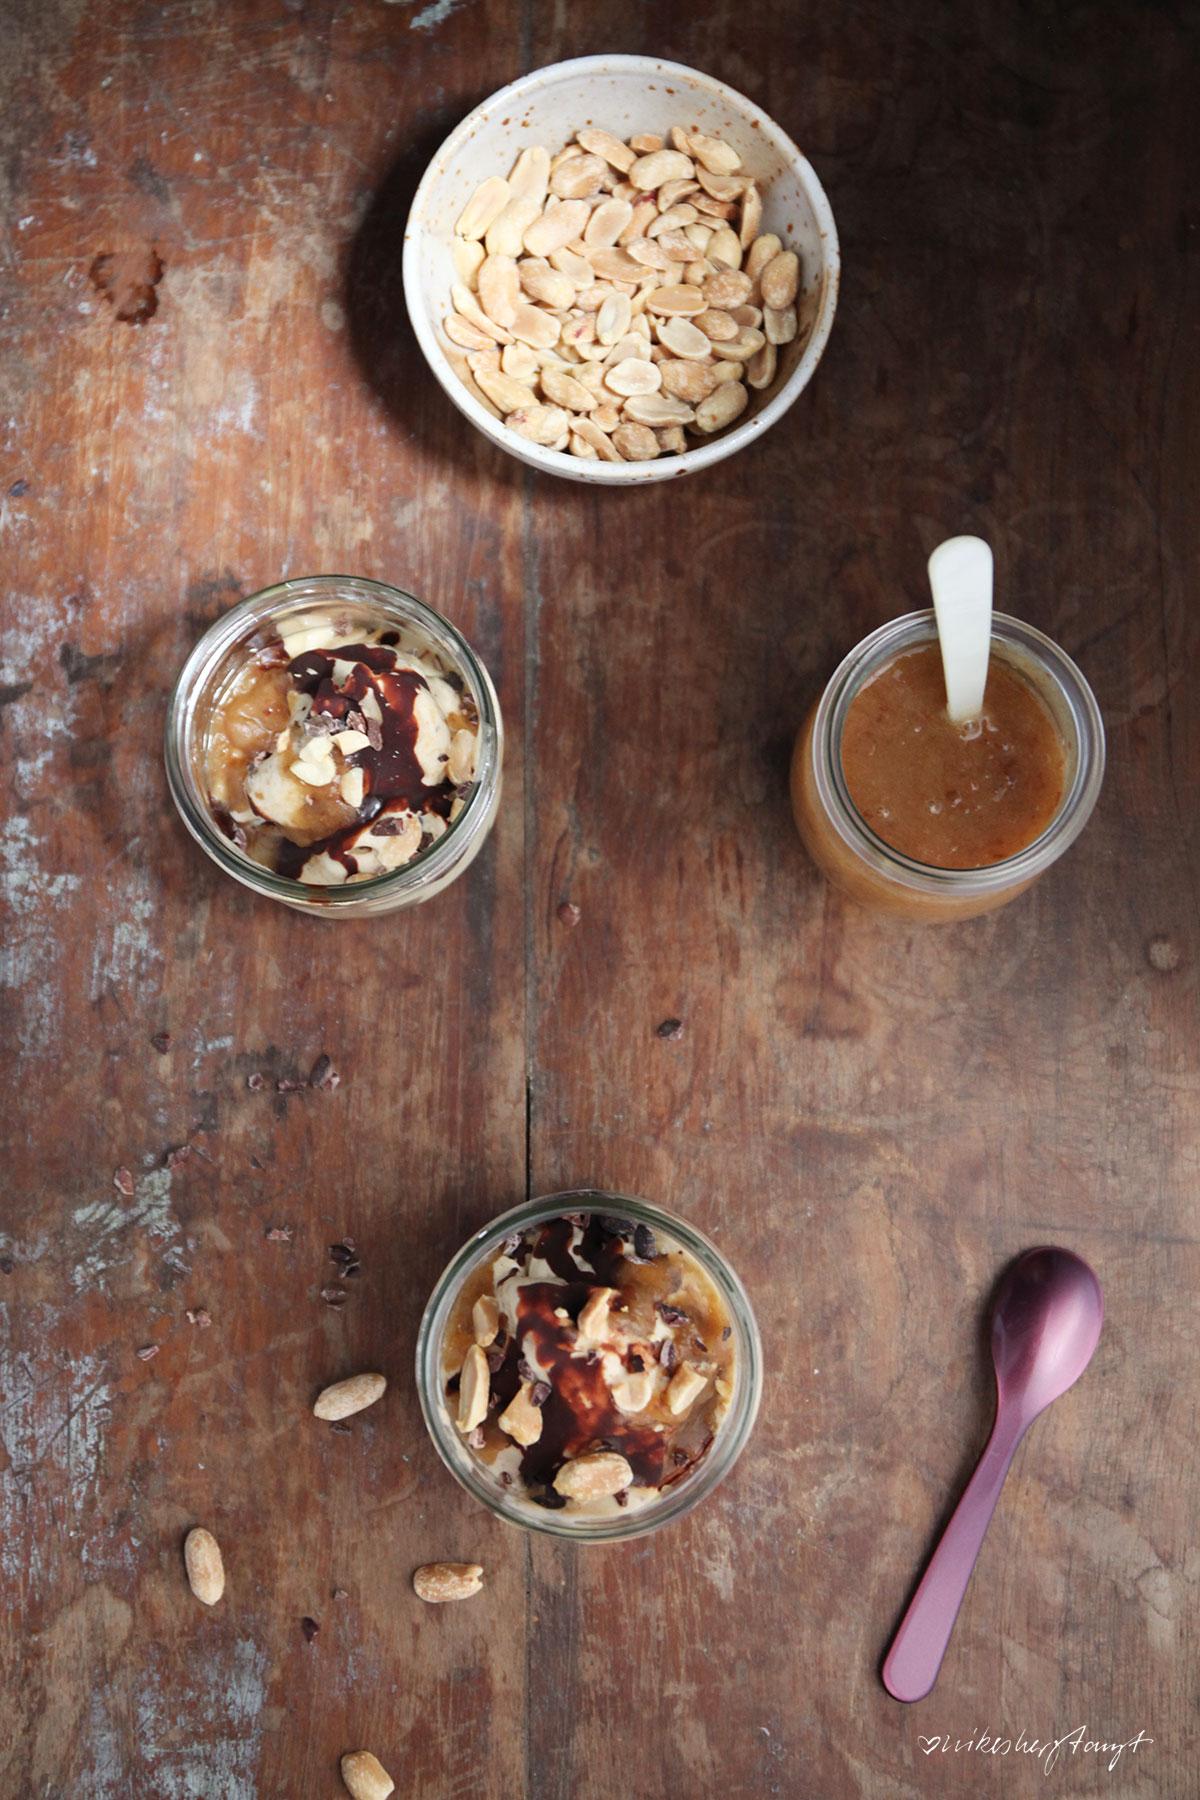 banana (n)icecream, gesalzenes dattel,karamell, erdnüsse, schokosauce, vegan, eiszeit, nikesherztanzt